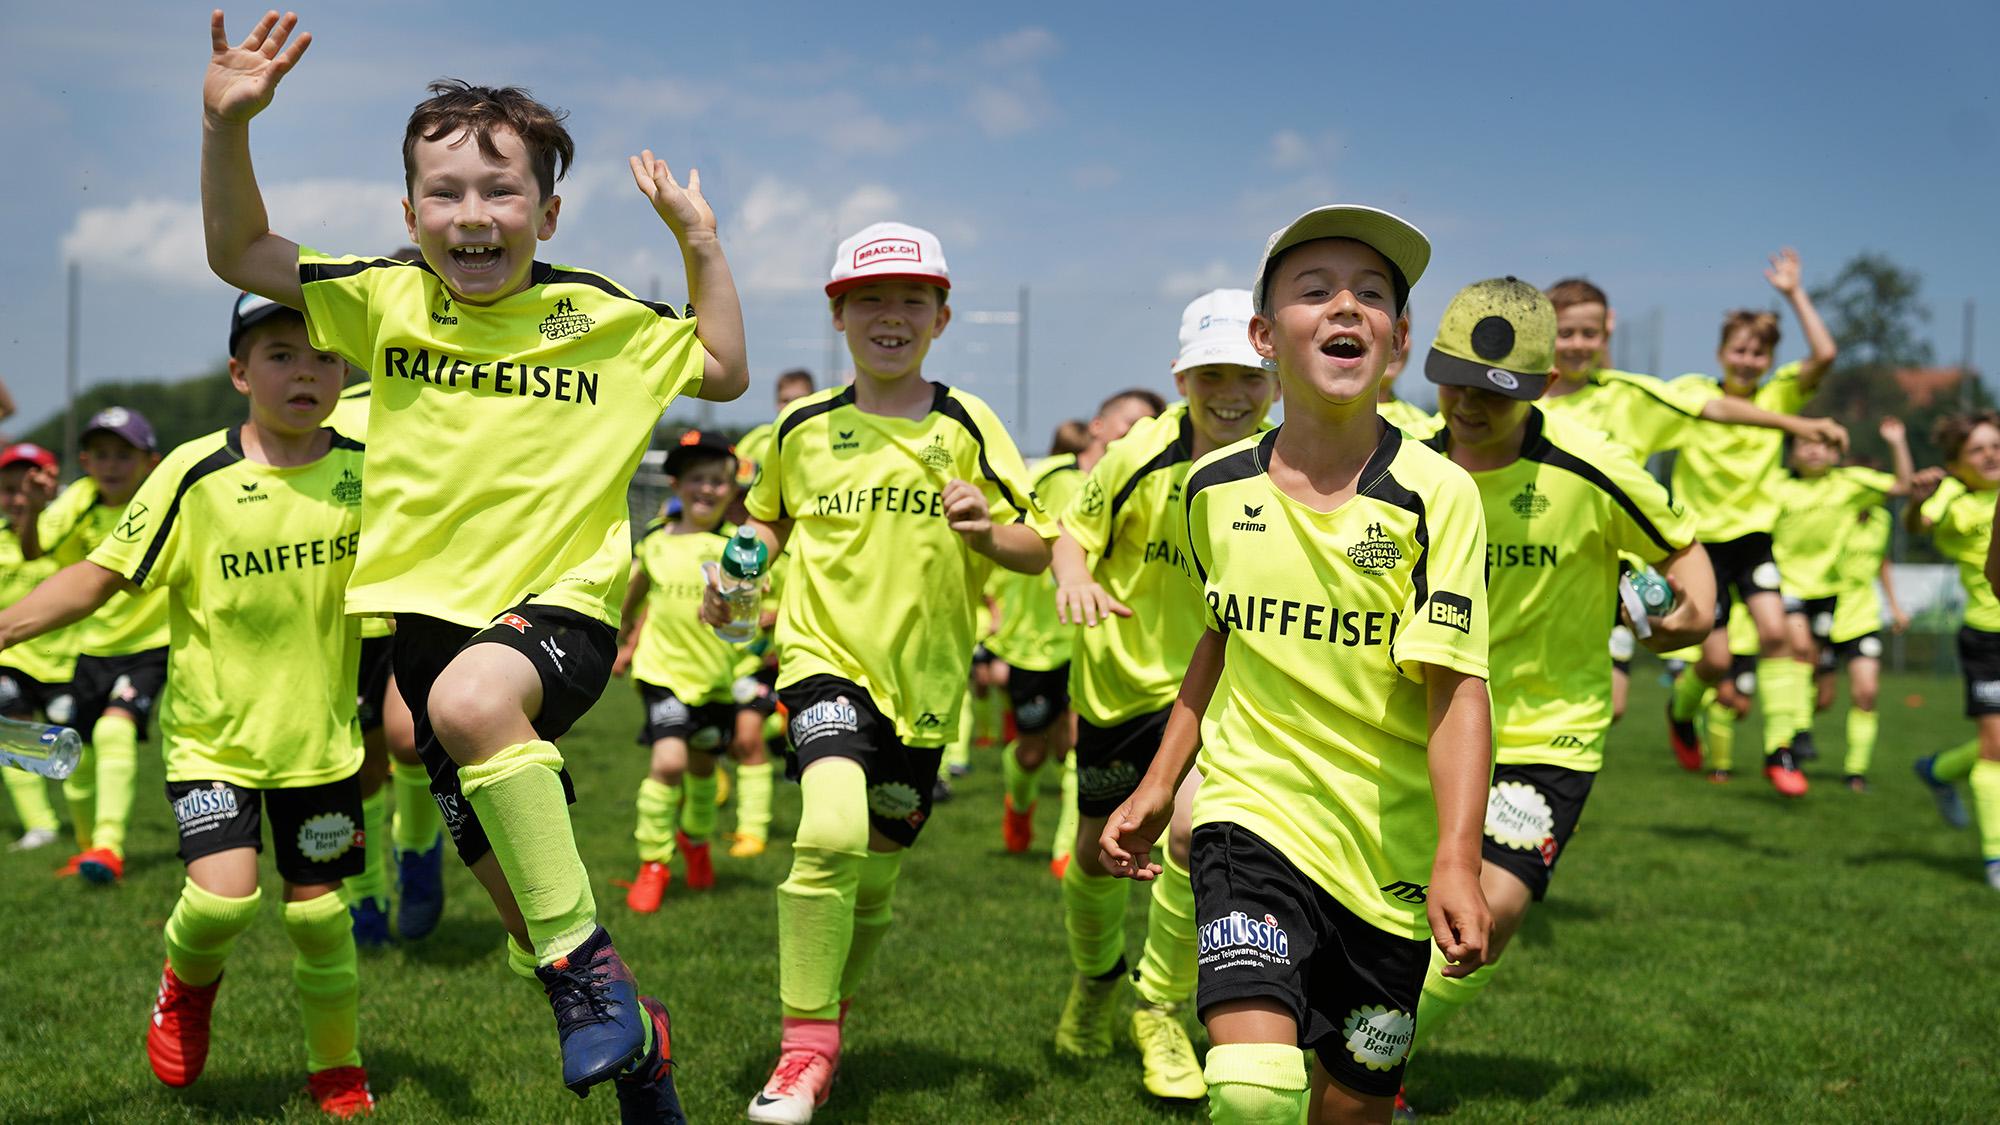 Raiffeisen Football Camp 2021